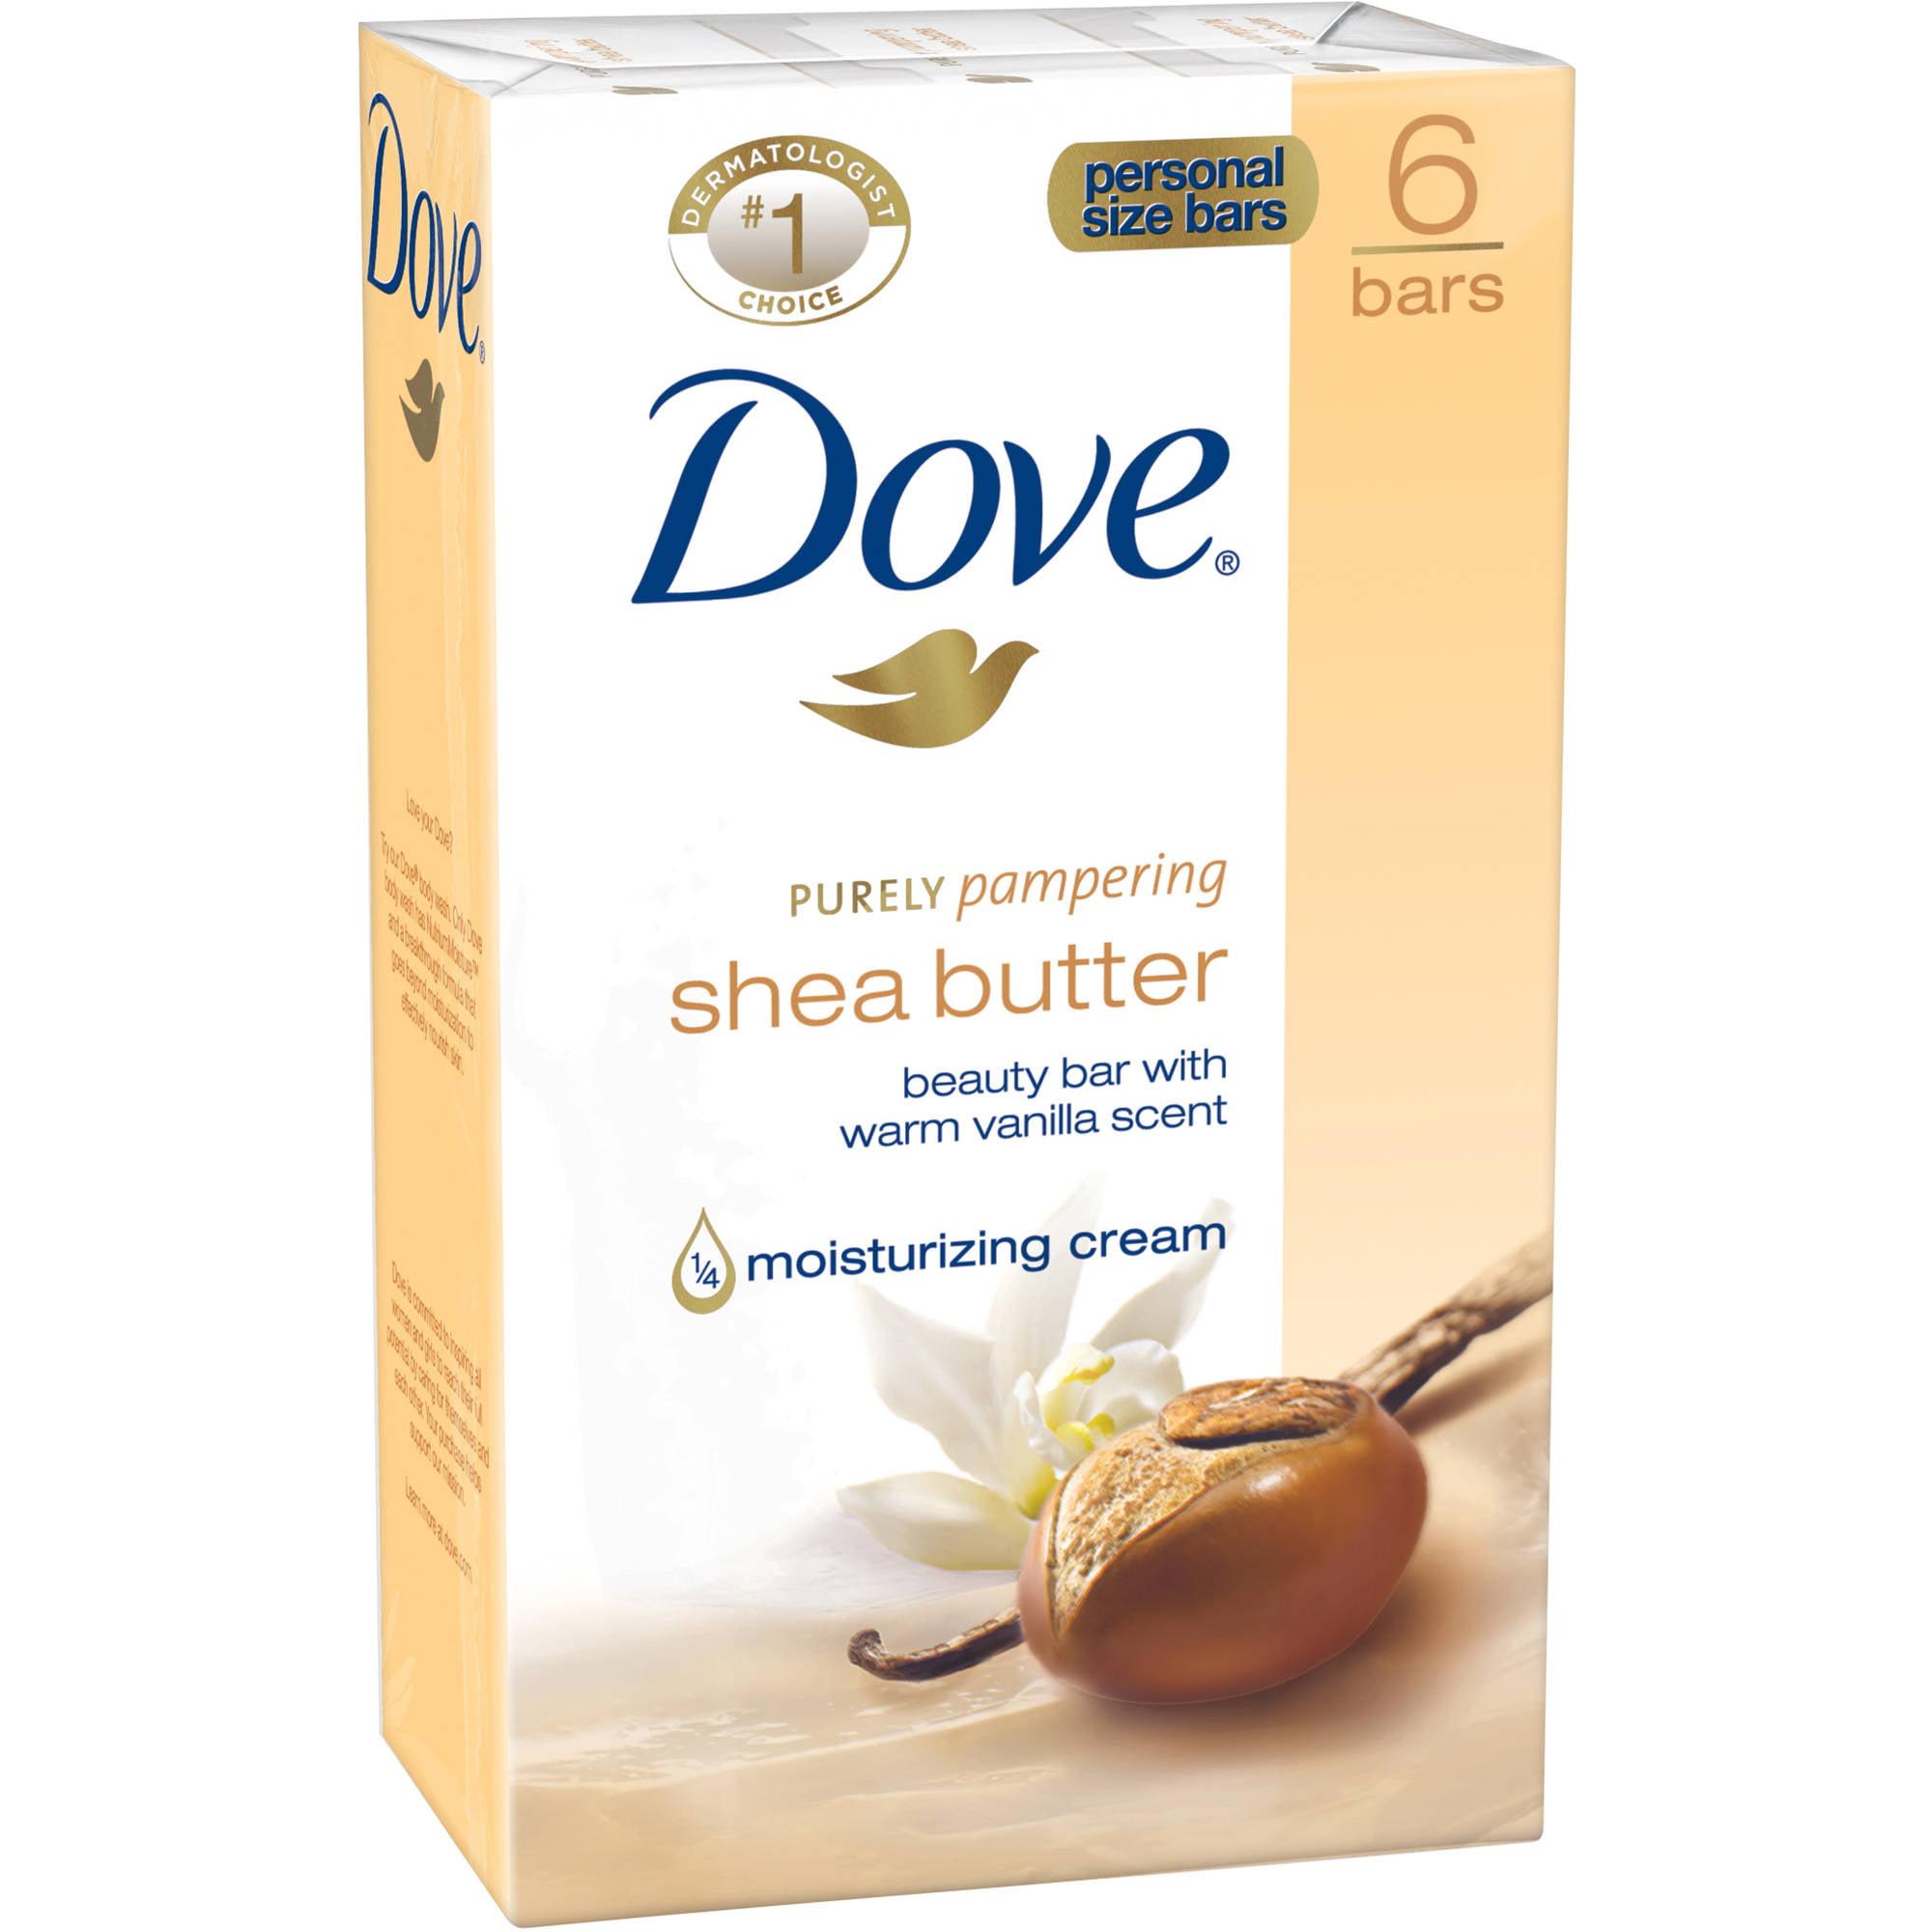 Dove Shea Butter Beauty Bars Soap, 6 count - Walmart.com